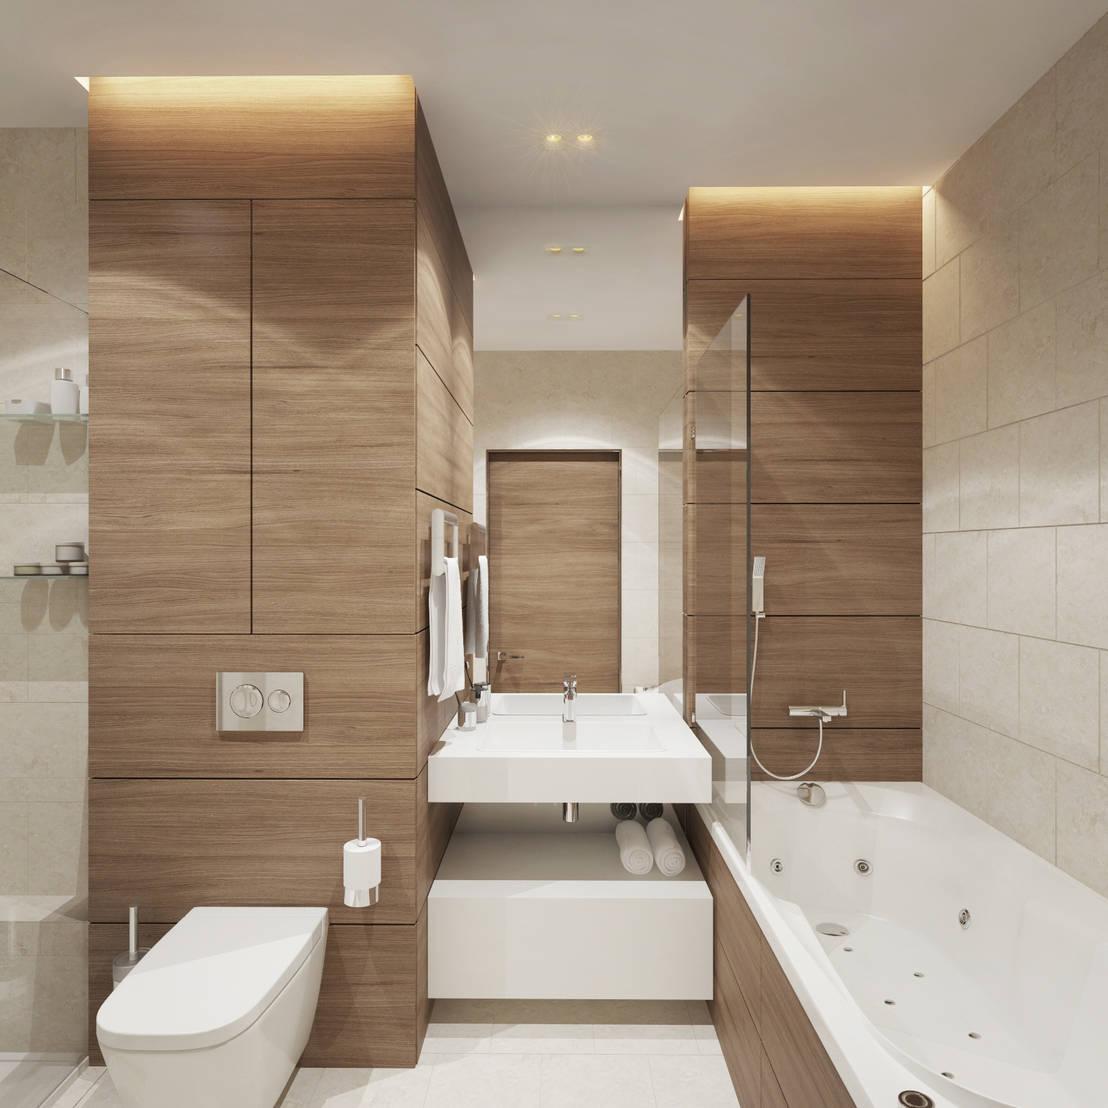 Modelos de banheiros para inspirar - Azulejos banos modernos pequenos ...